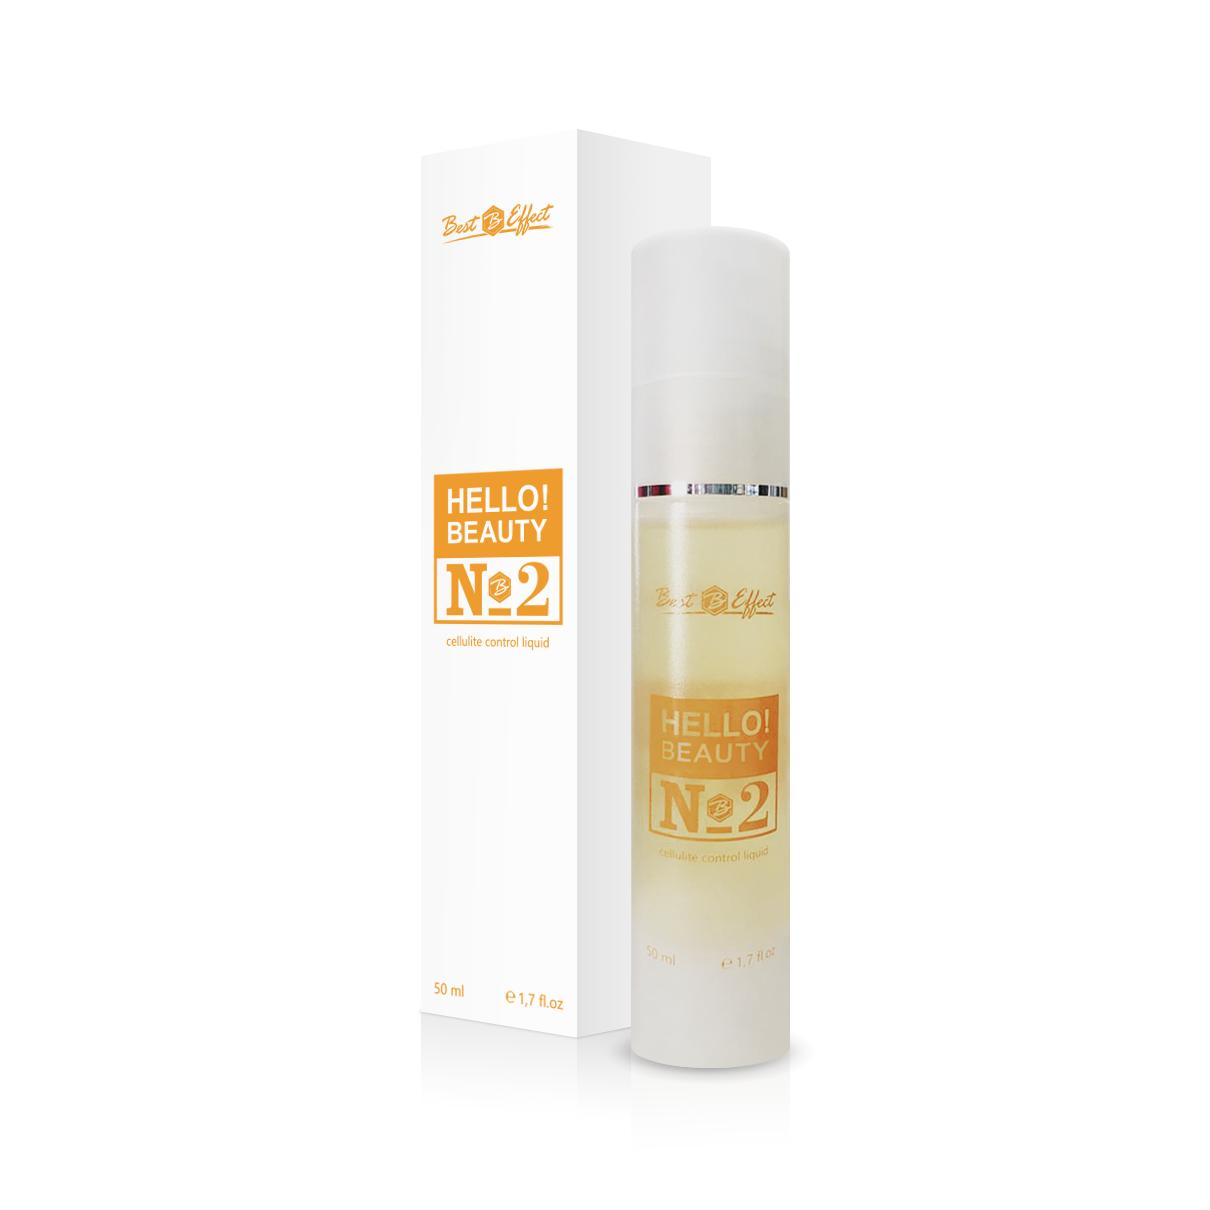 Hello!Beauty N2 cellulite control liquid